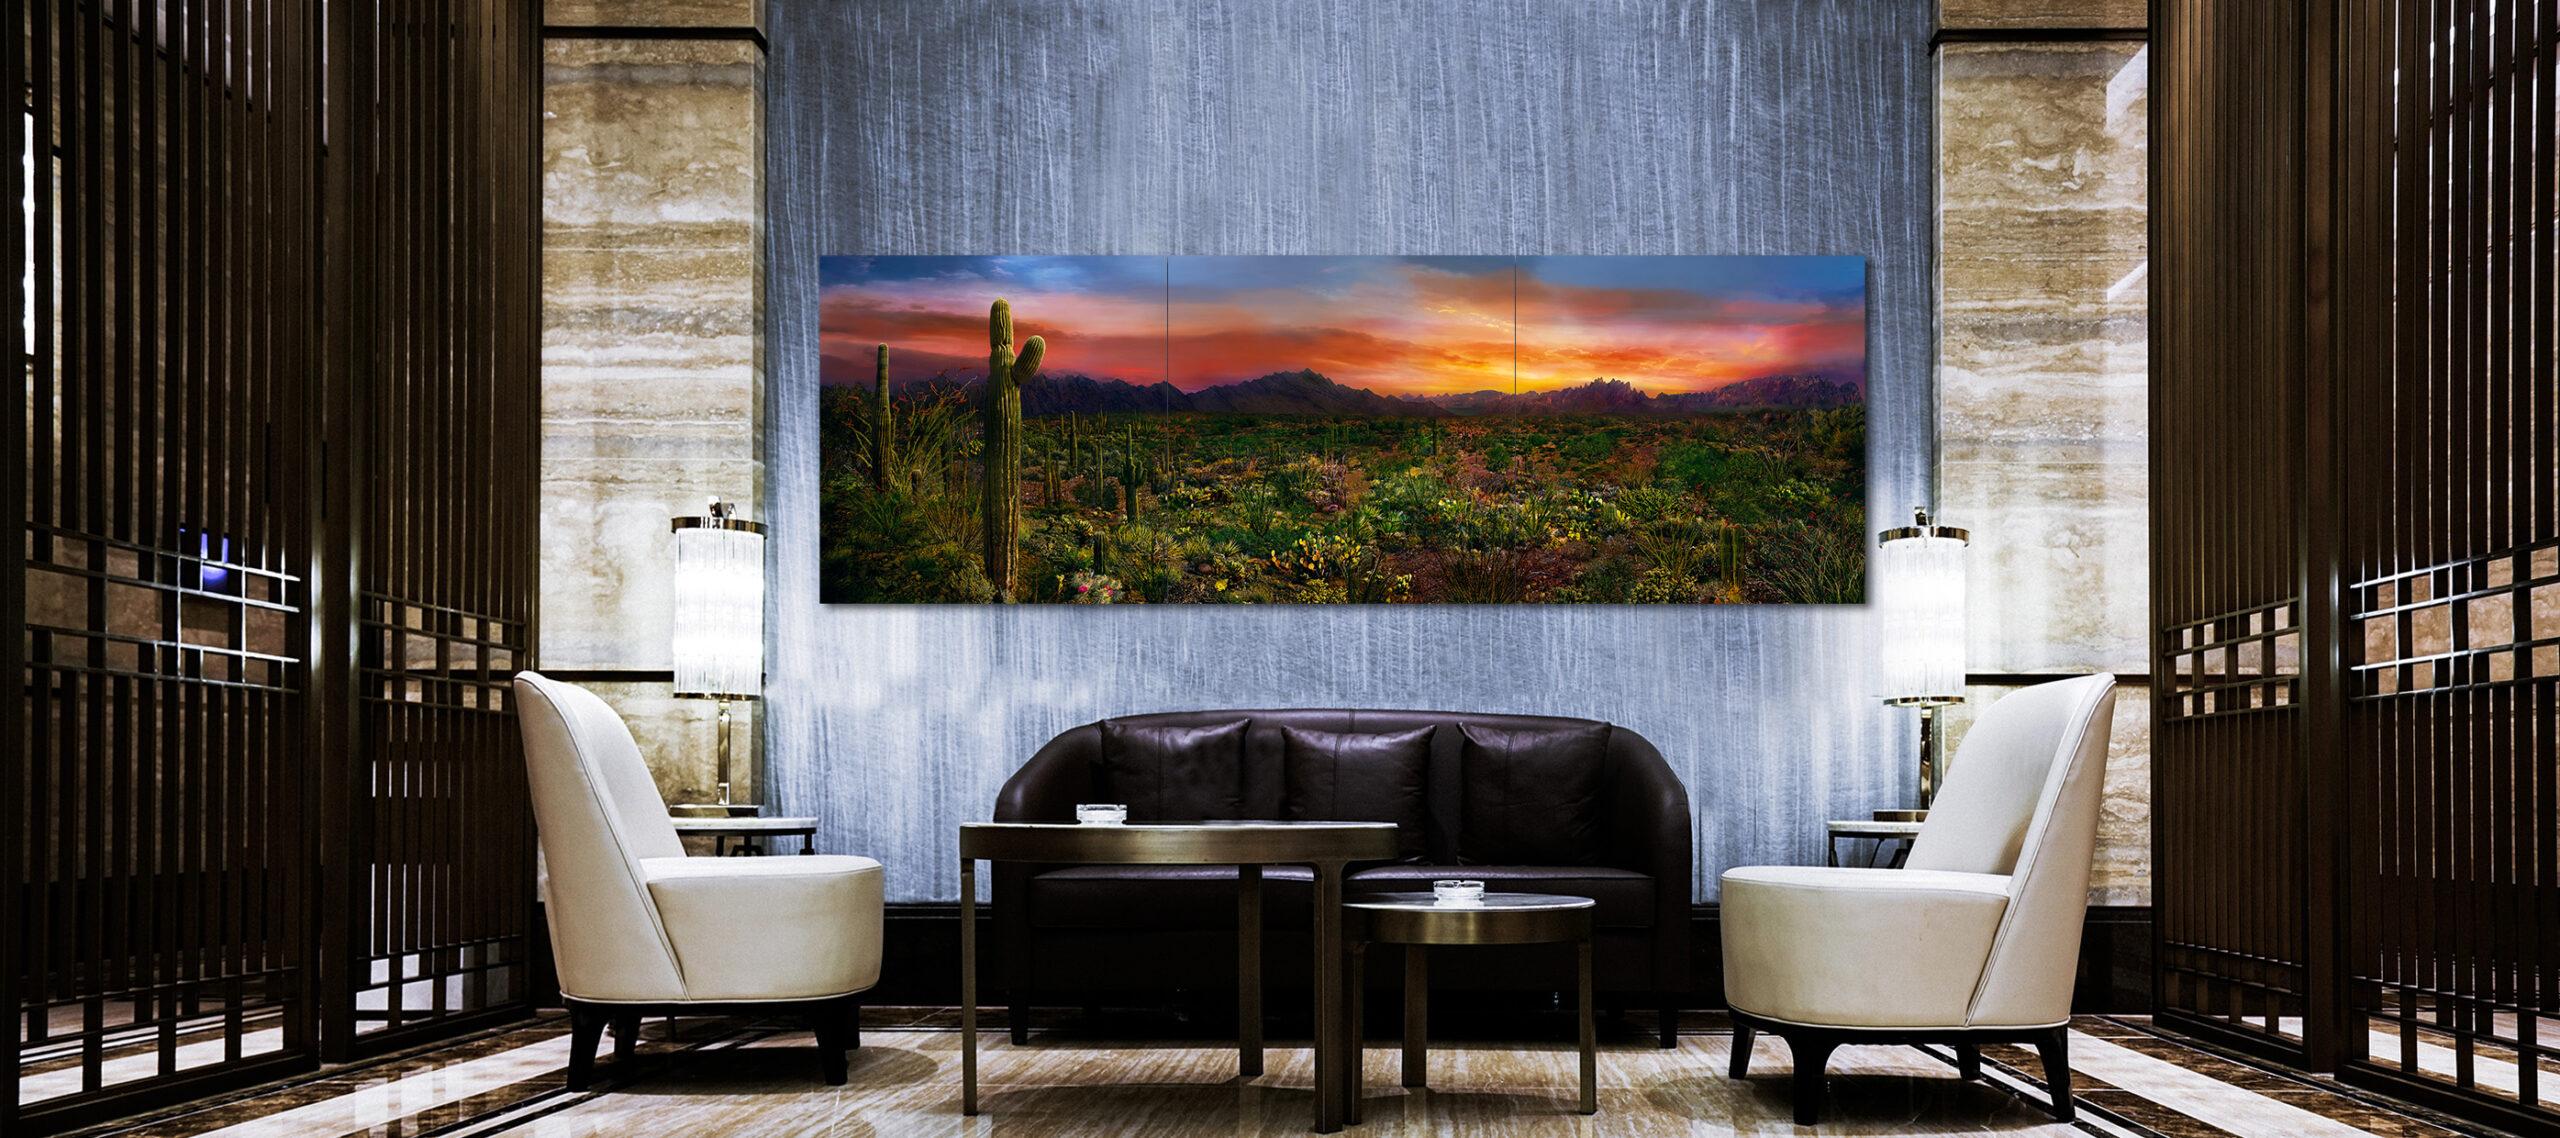 Luxury,Lobby,Interior.